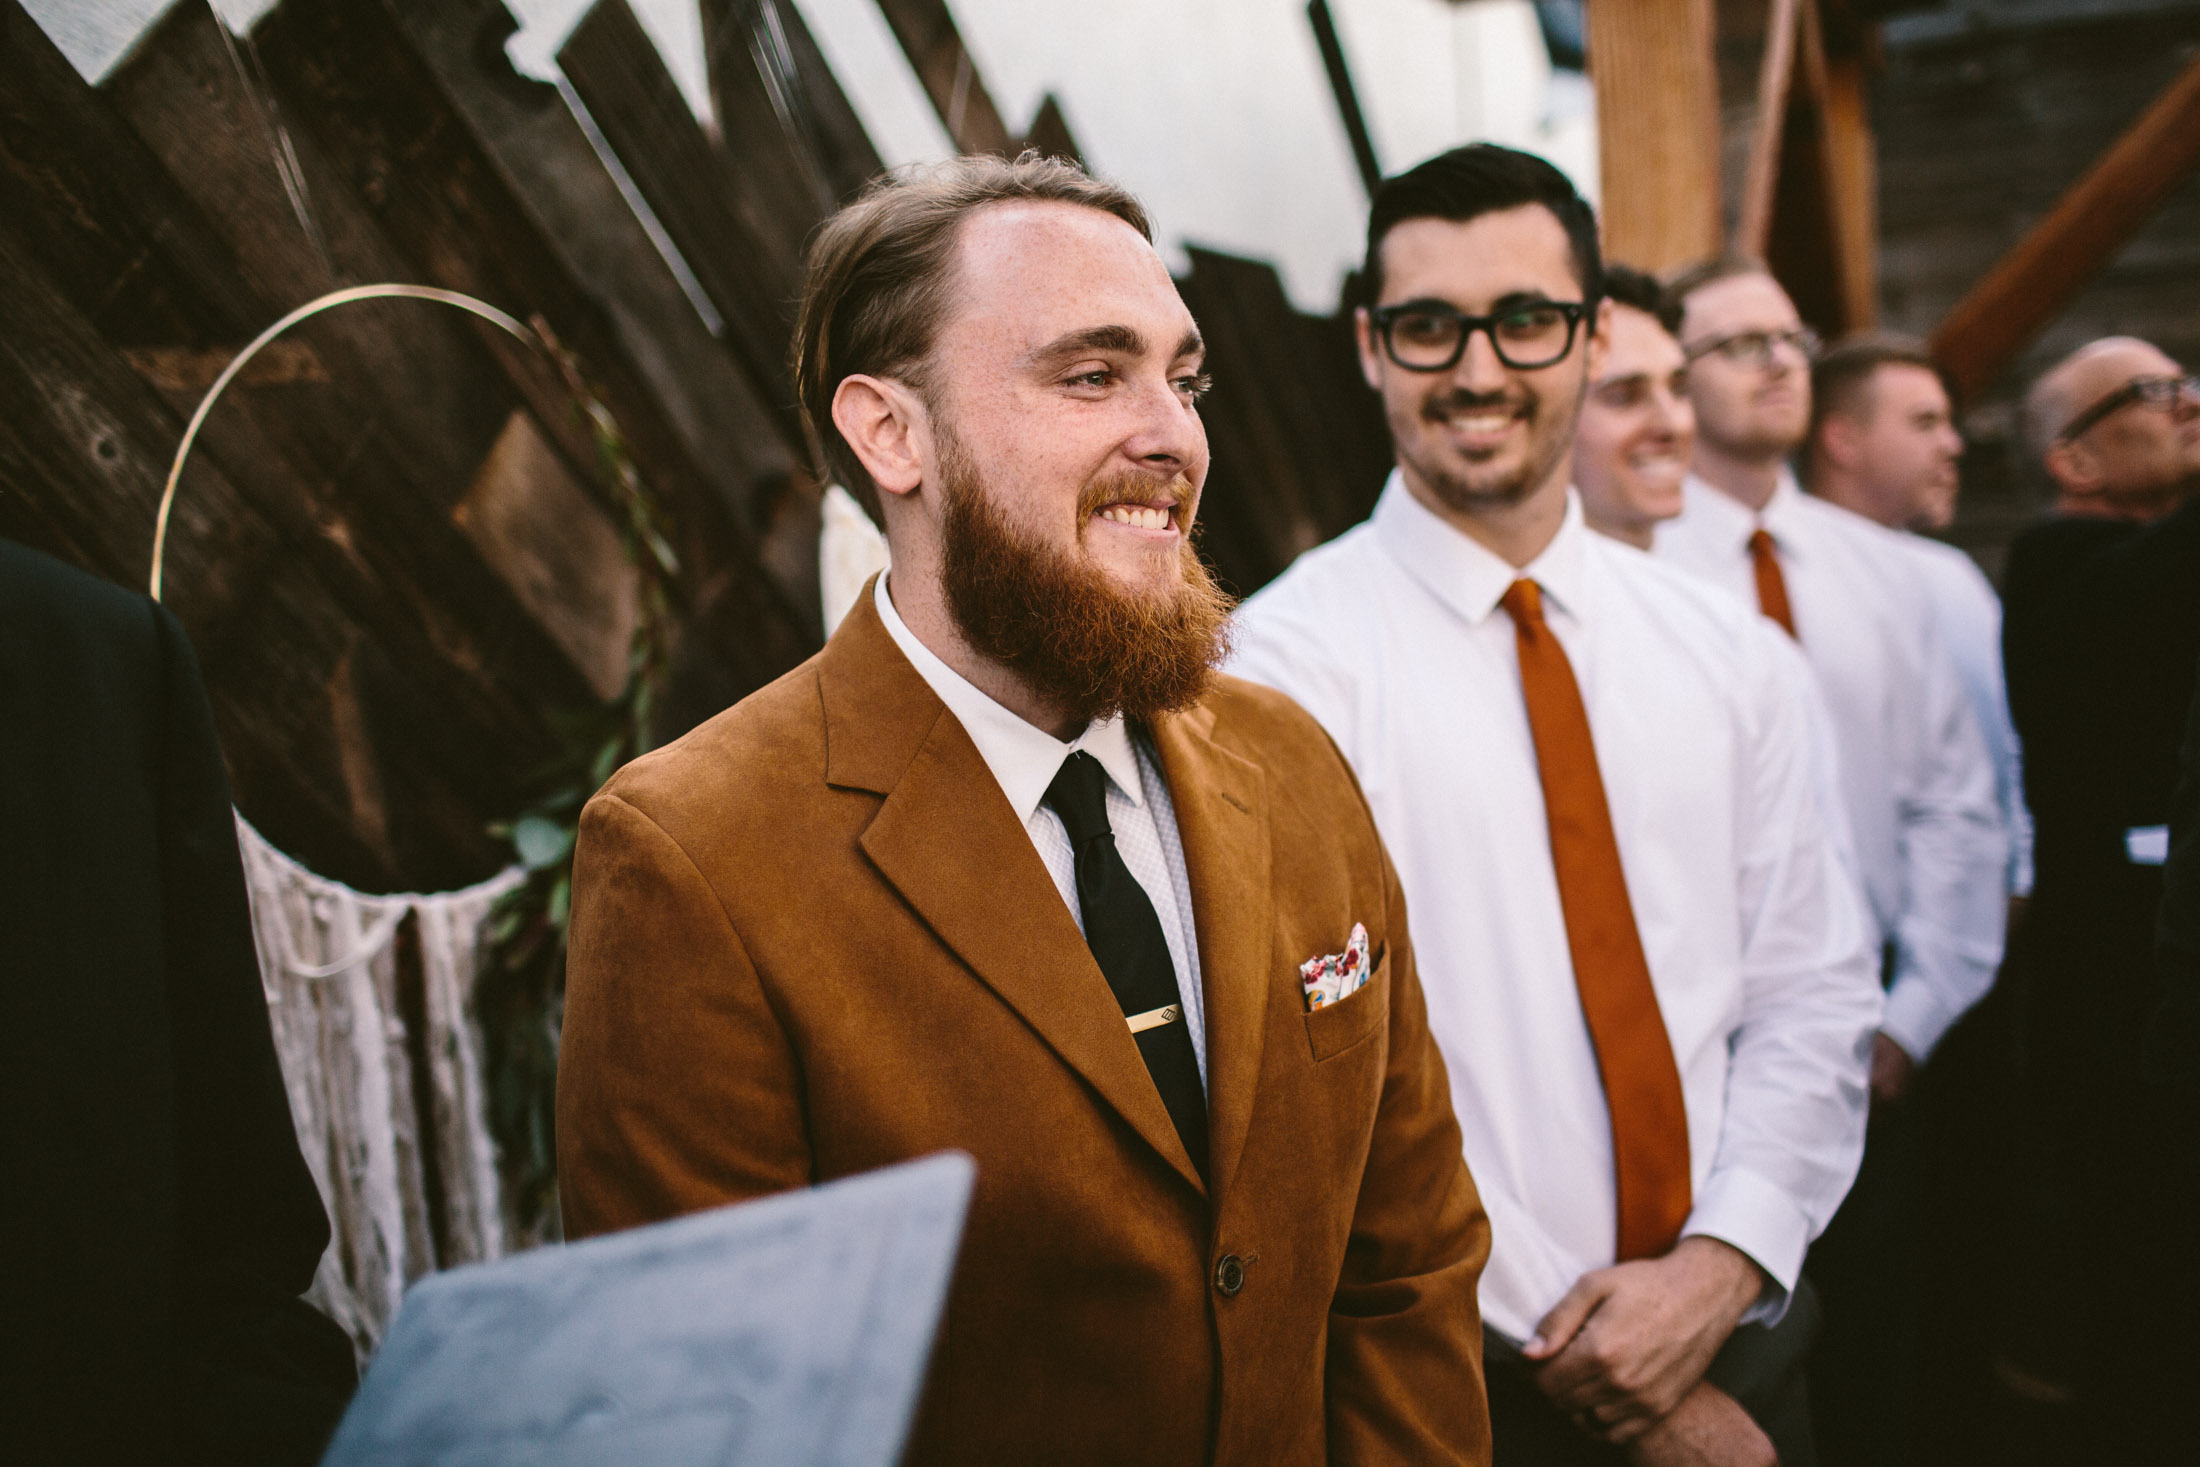 The-woodshed-booze-brothers-venue-wedding-70.jpg